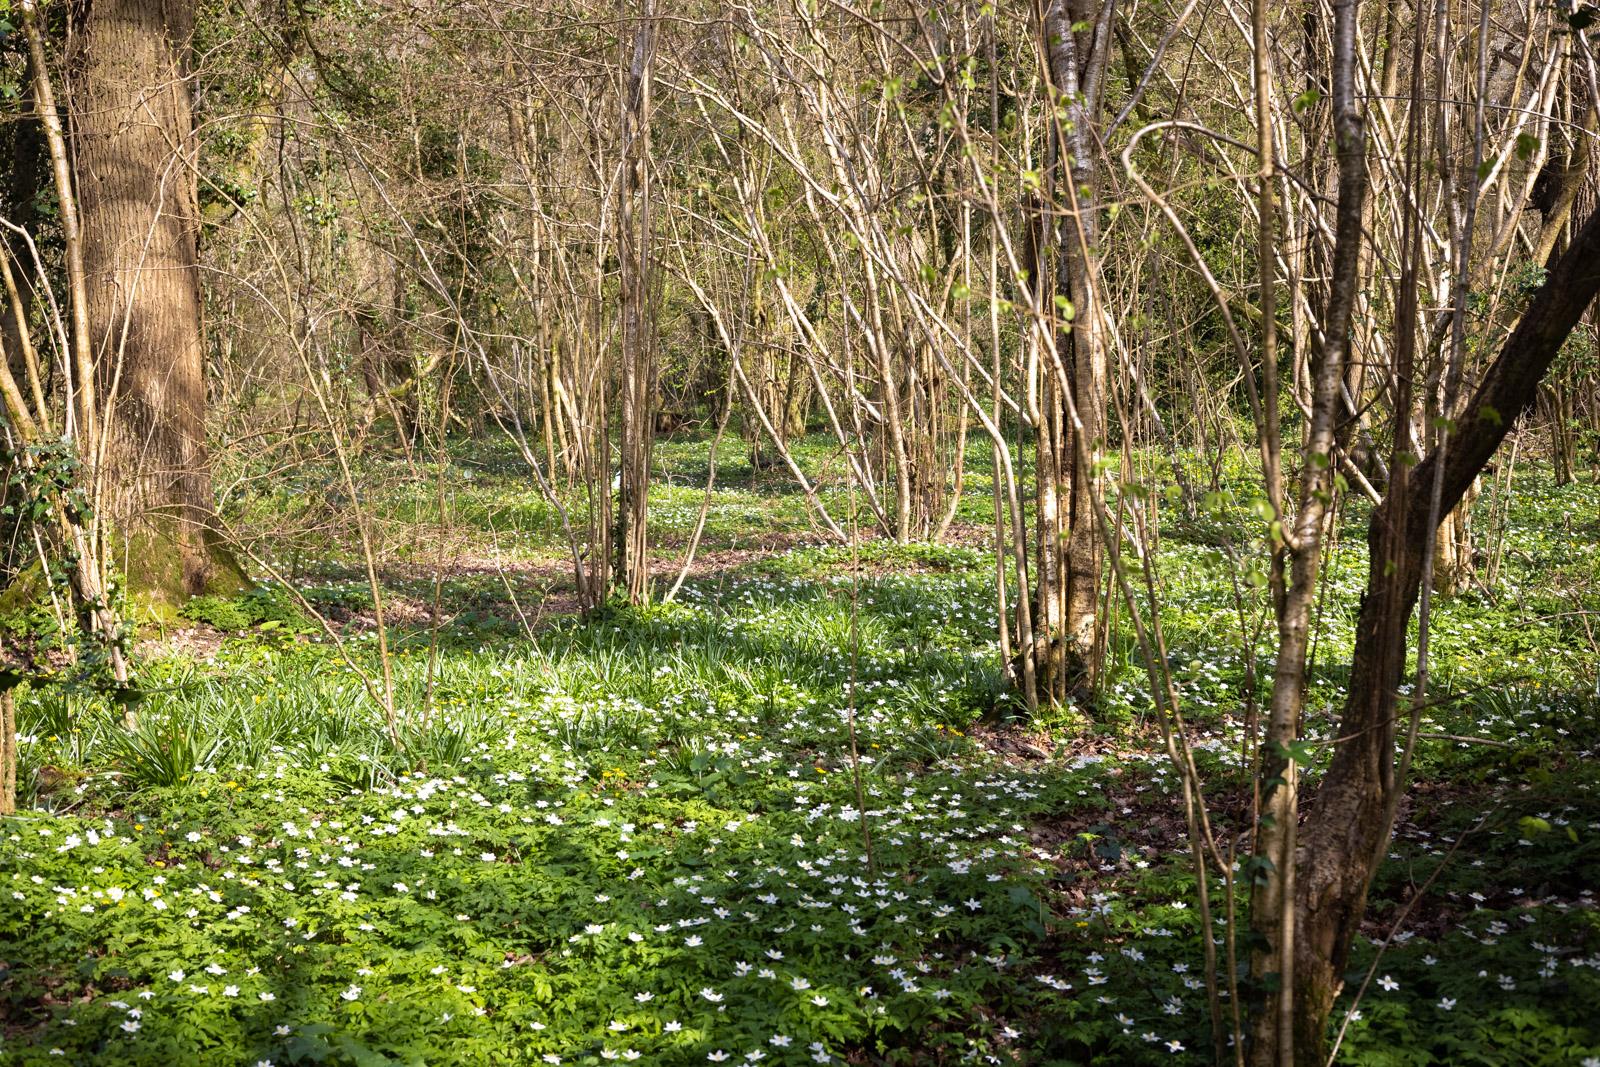 Wood Anemones - Park Wood, Wells, Somerset, UK. ID K2A0496